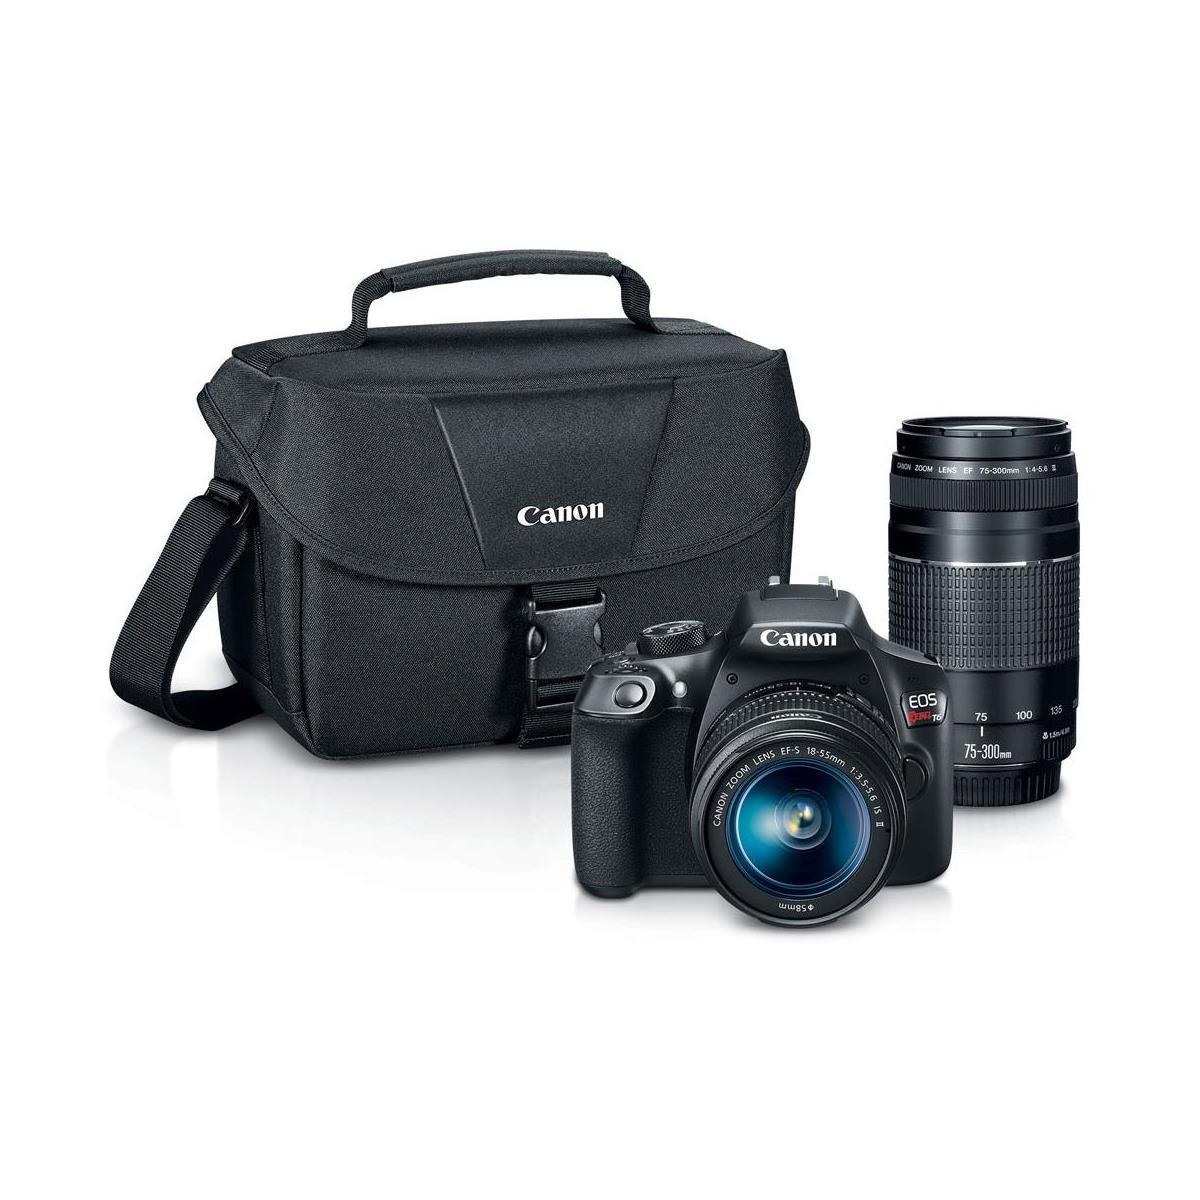 Canon T6 DSLR Bundle - 18-55mm & 75-300mm - Pixma Pro Printer $349 After Rebate